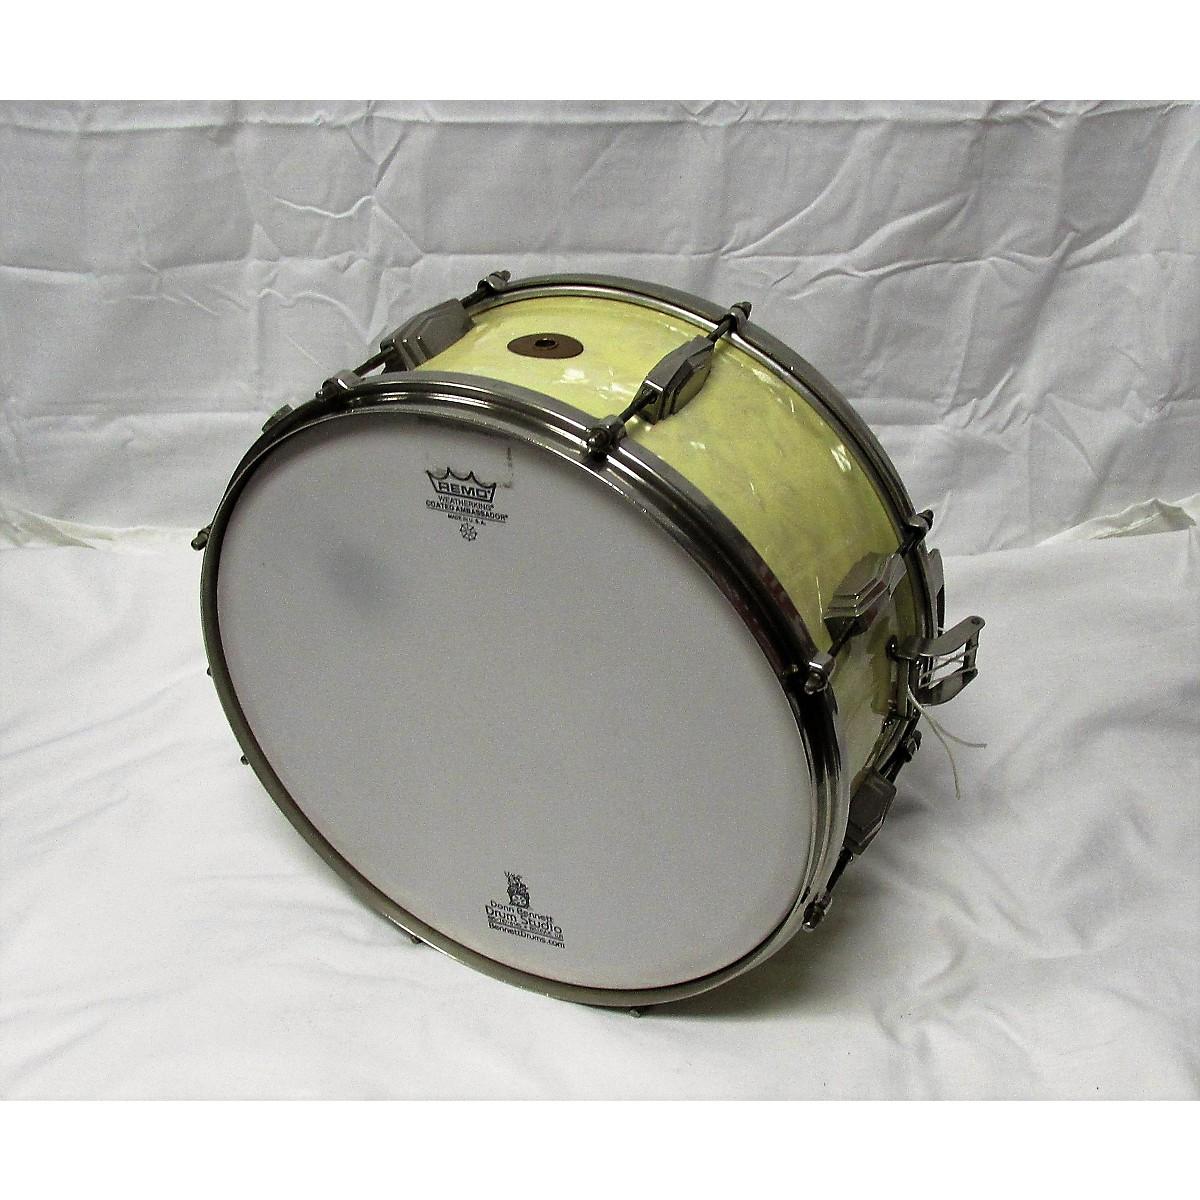 Ludwig 1920s 6.5X14 Ludwig Super Drum